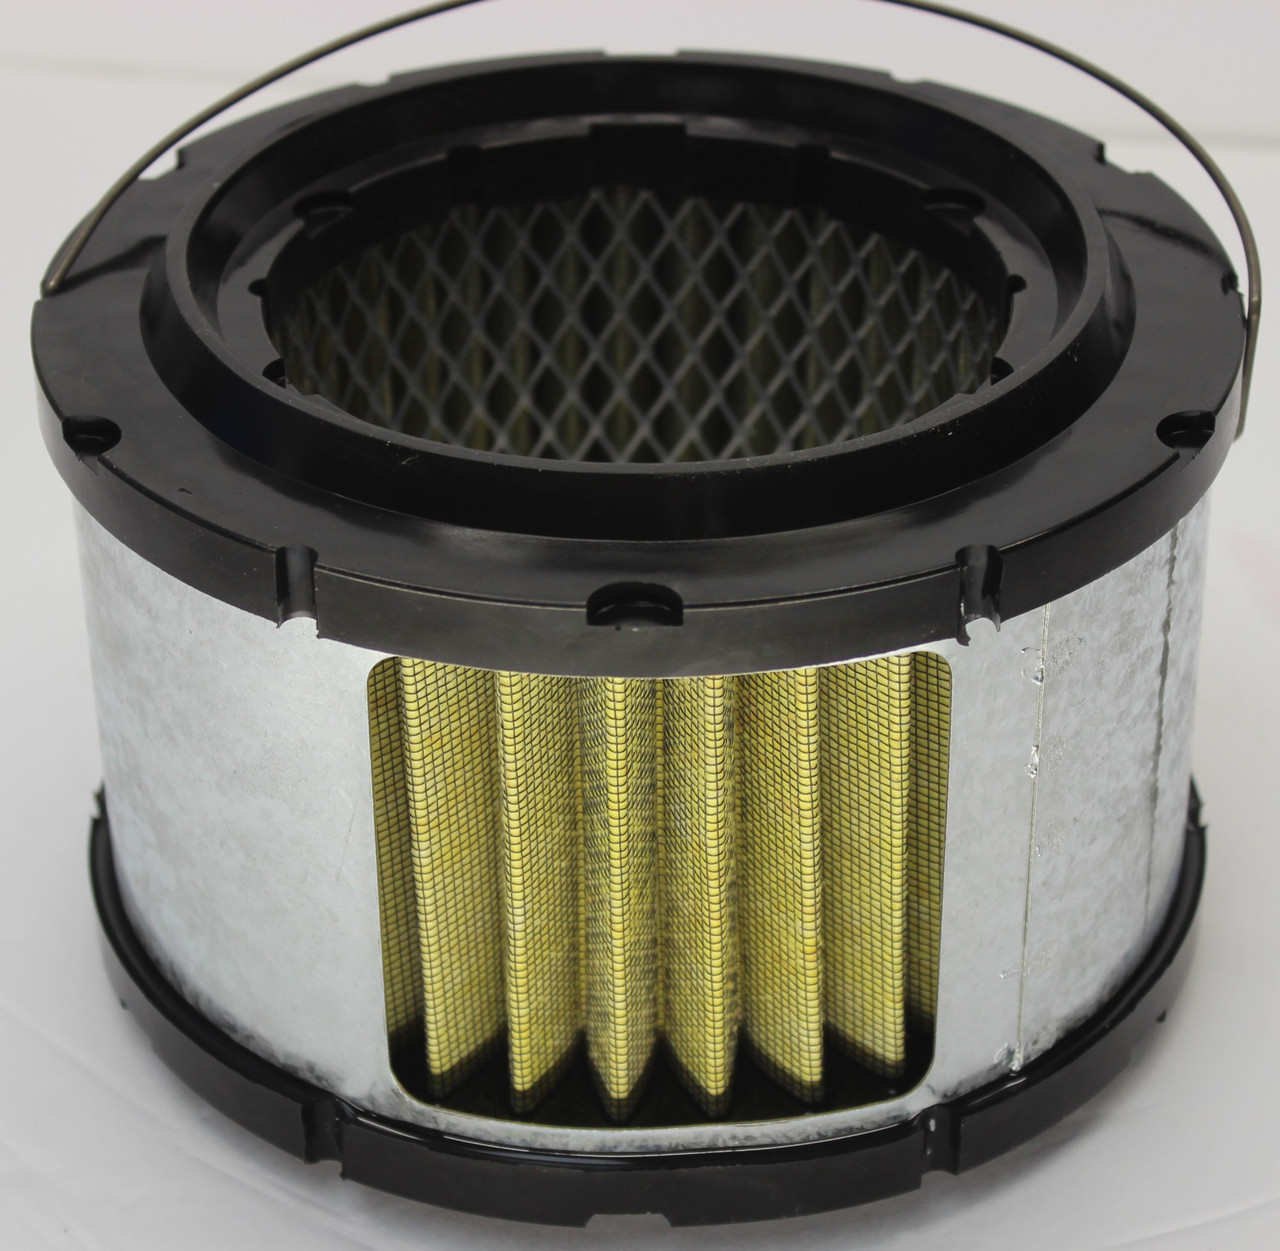 Cummins Replacement Coalescing Filter for 3971076